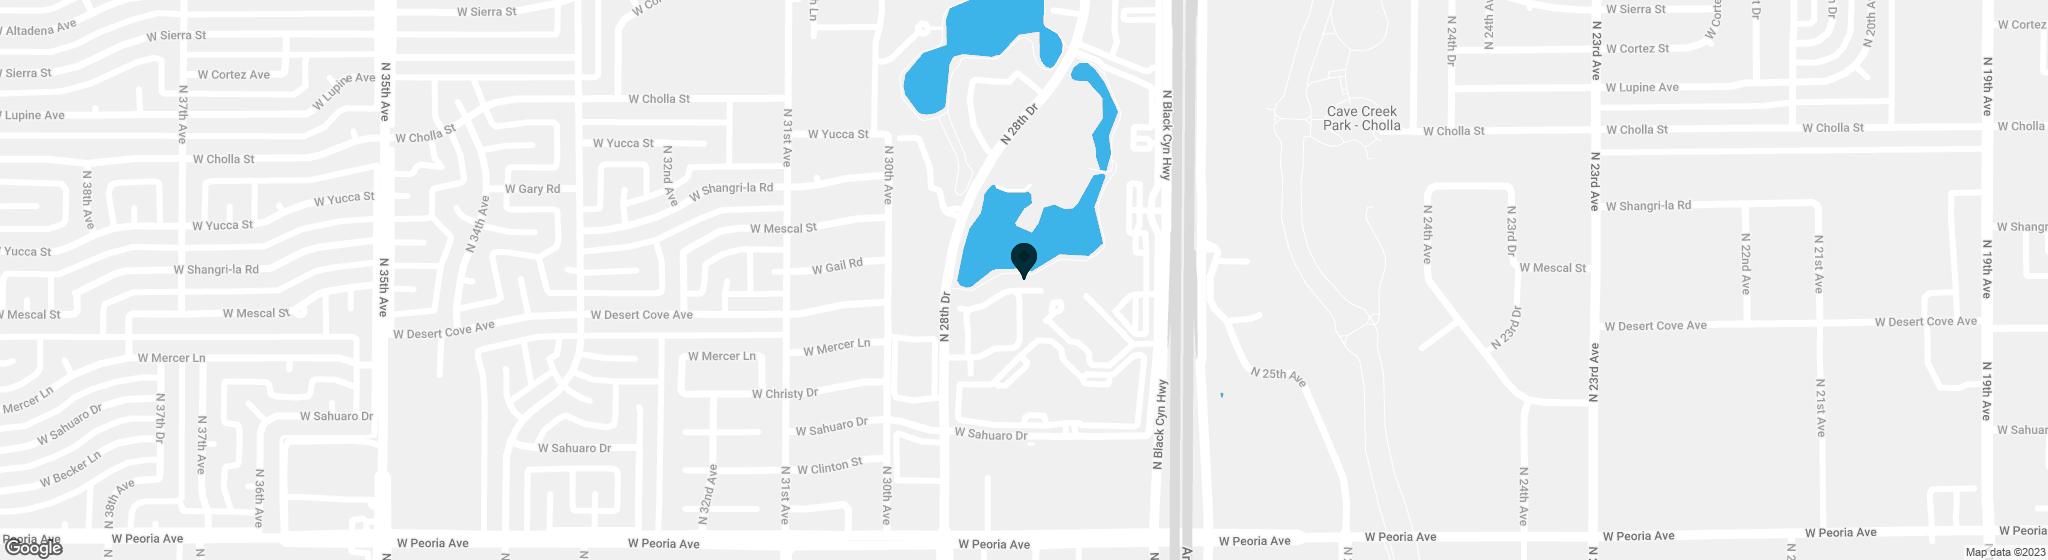 2654 W DESERT COVE Avenue Phoenix AZ 85029